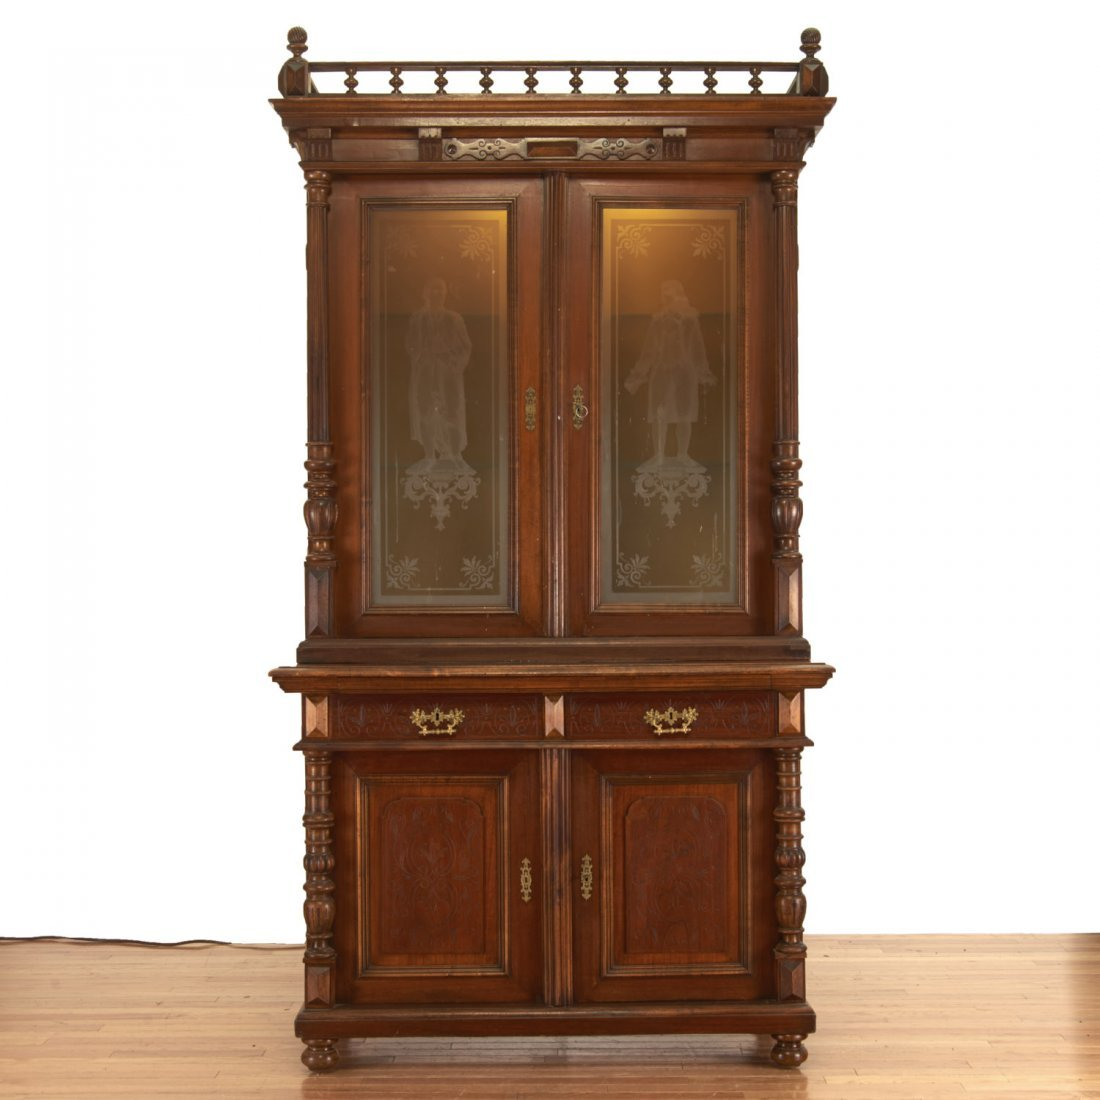 German Jacobean style mahogany bookcase cabinet